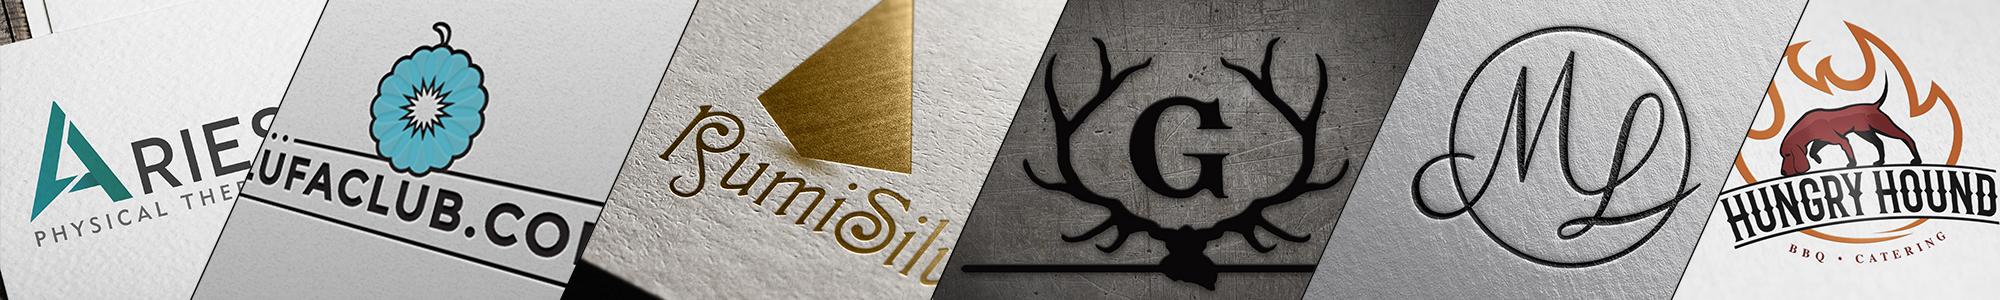 Restaurant Branding Footer Image Spokane WA